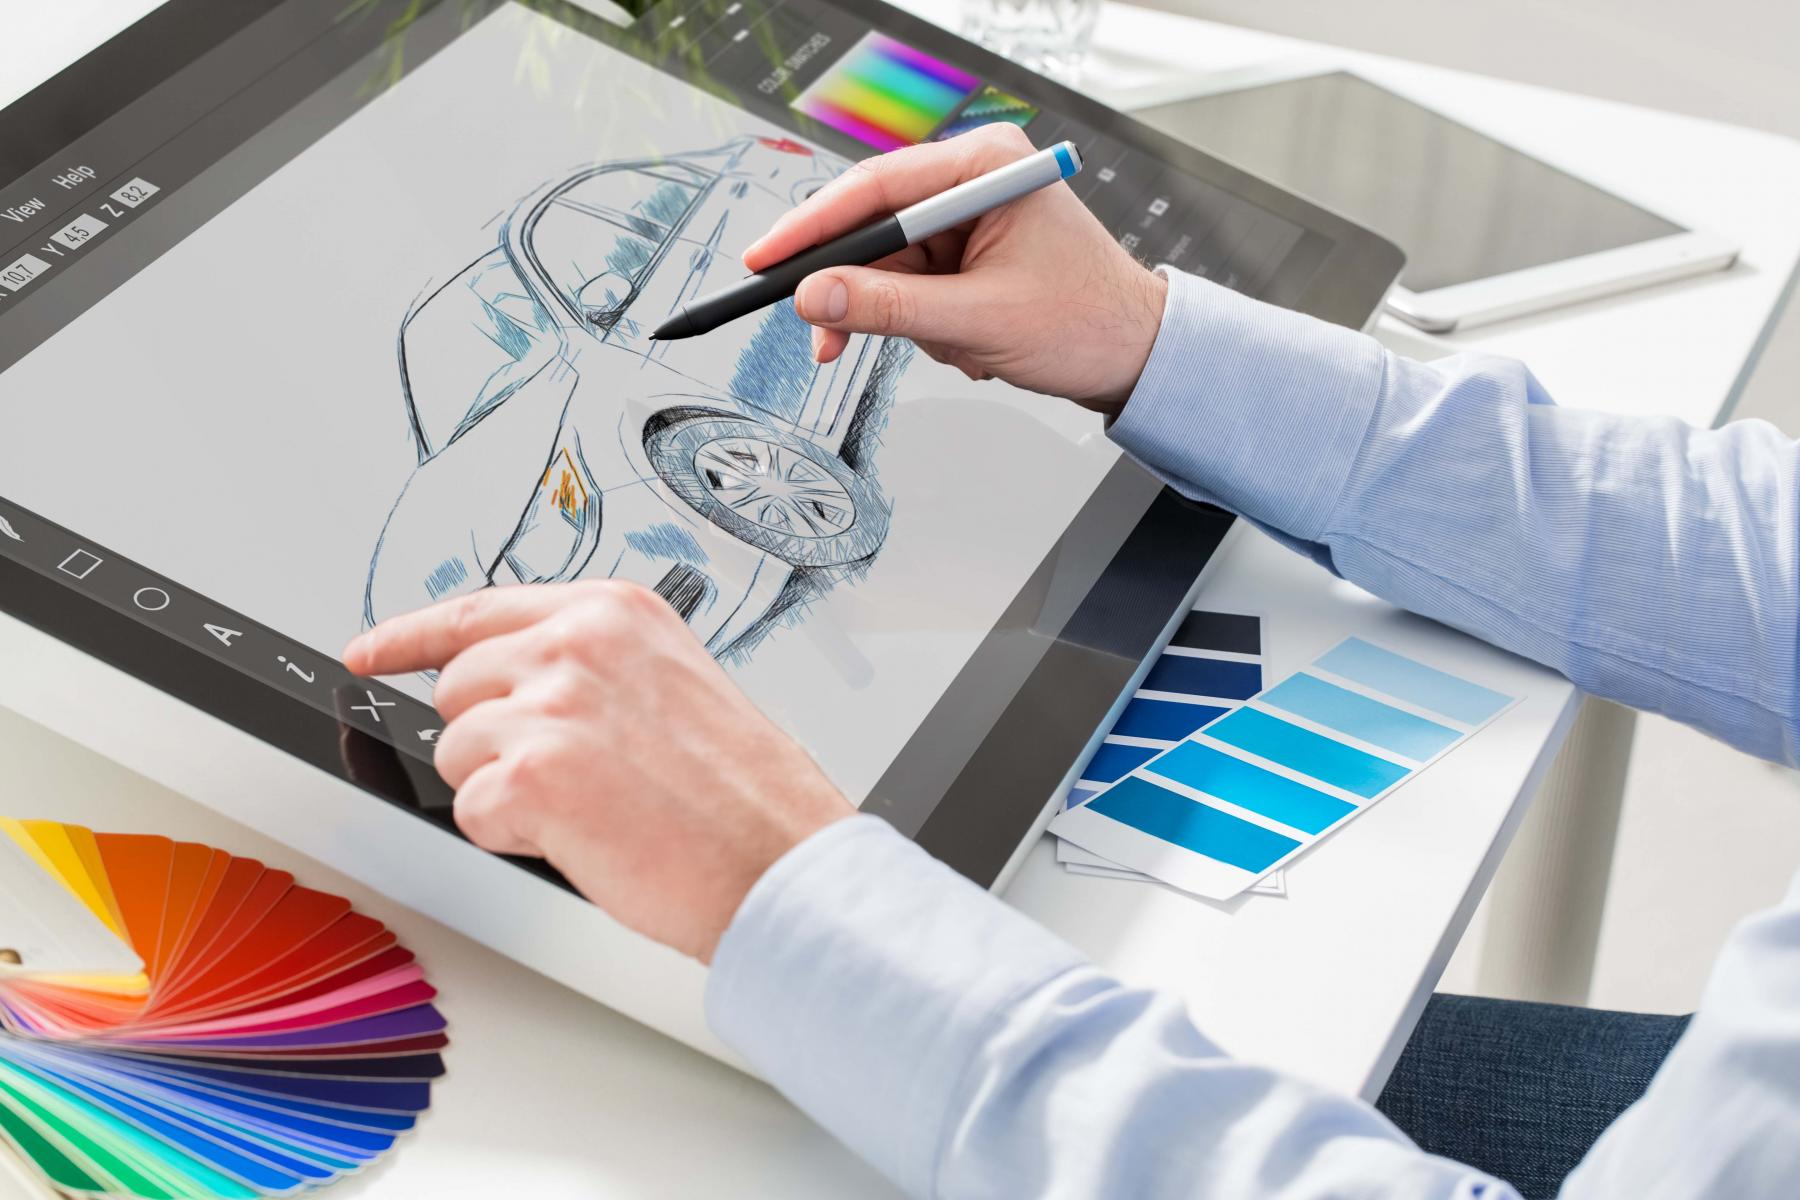 Sketching, 3D, graphic design